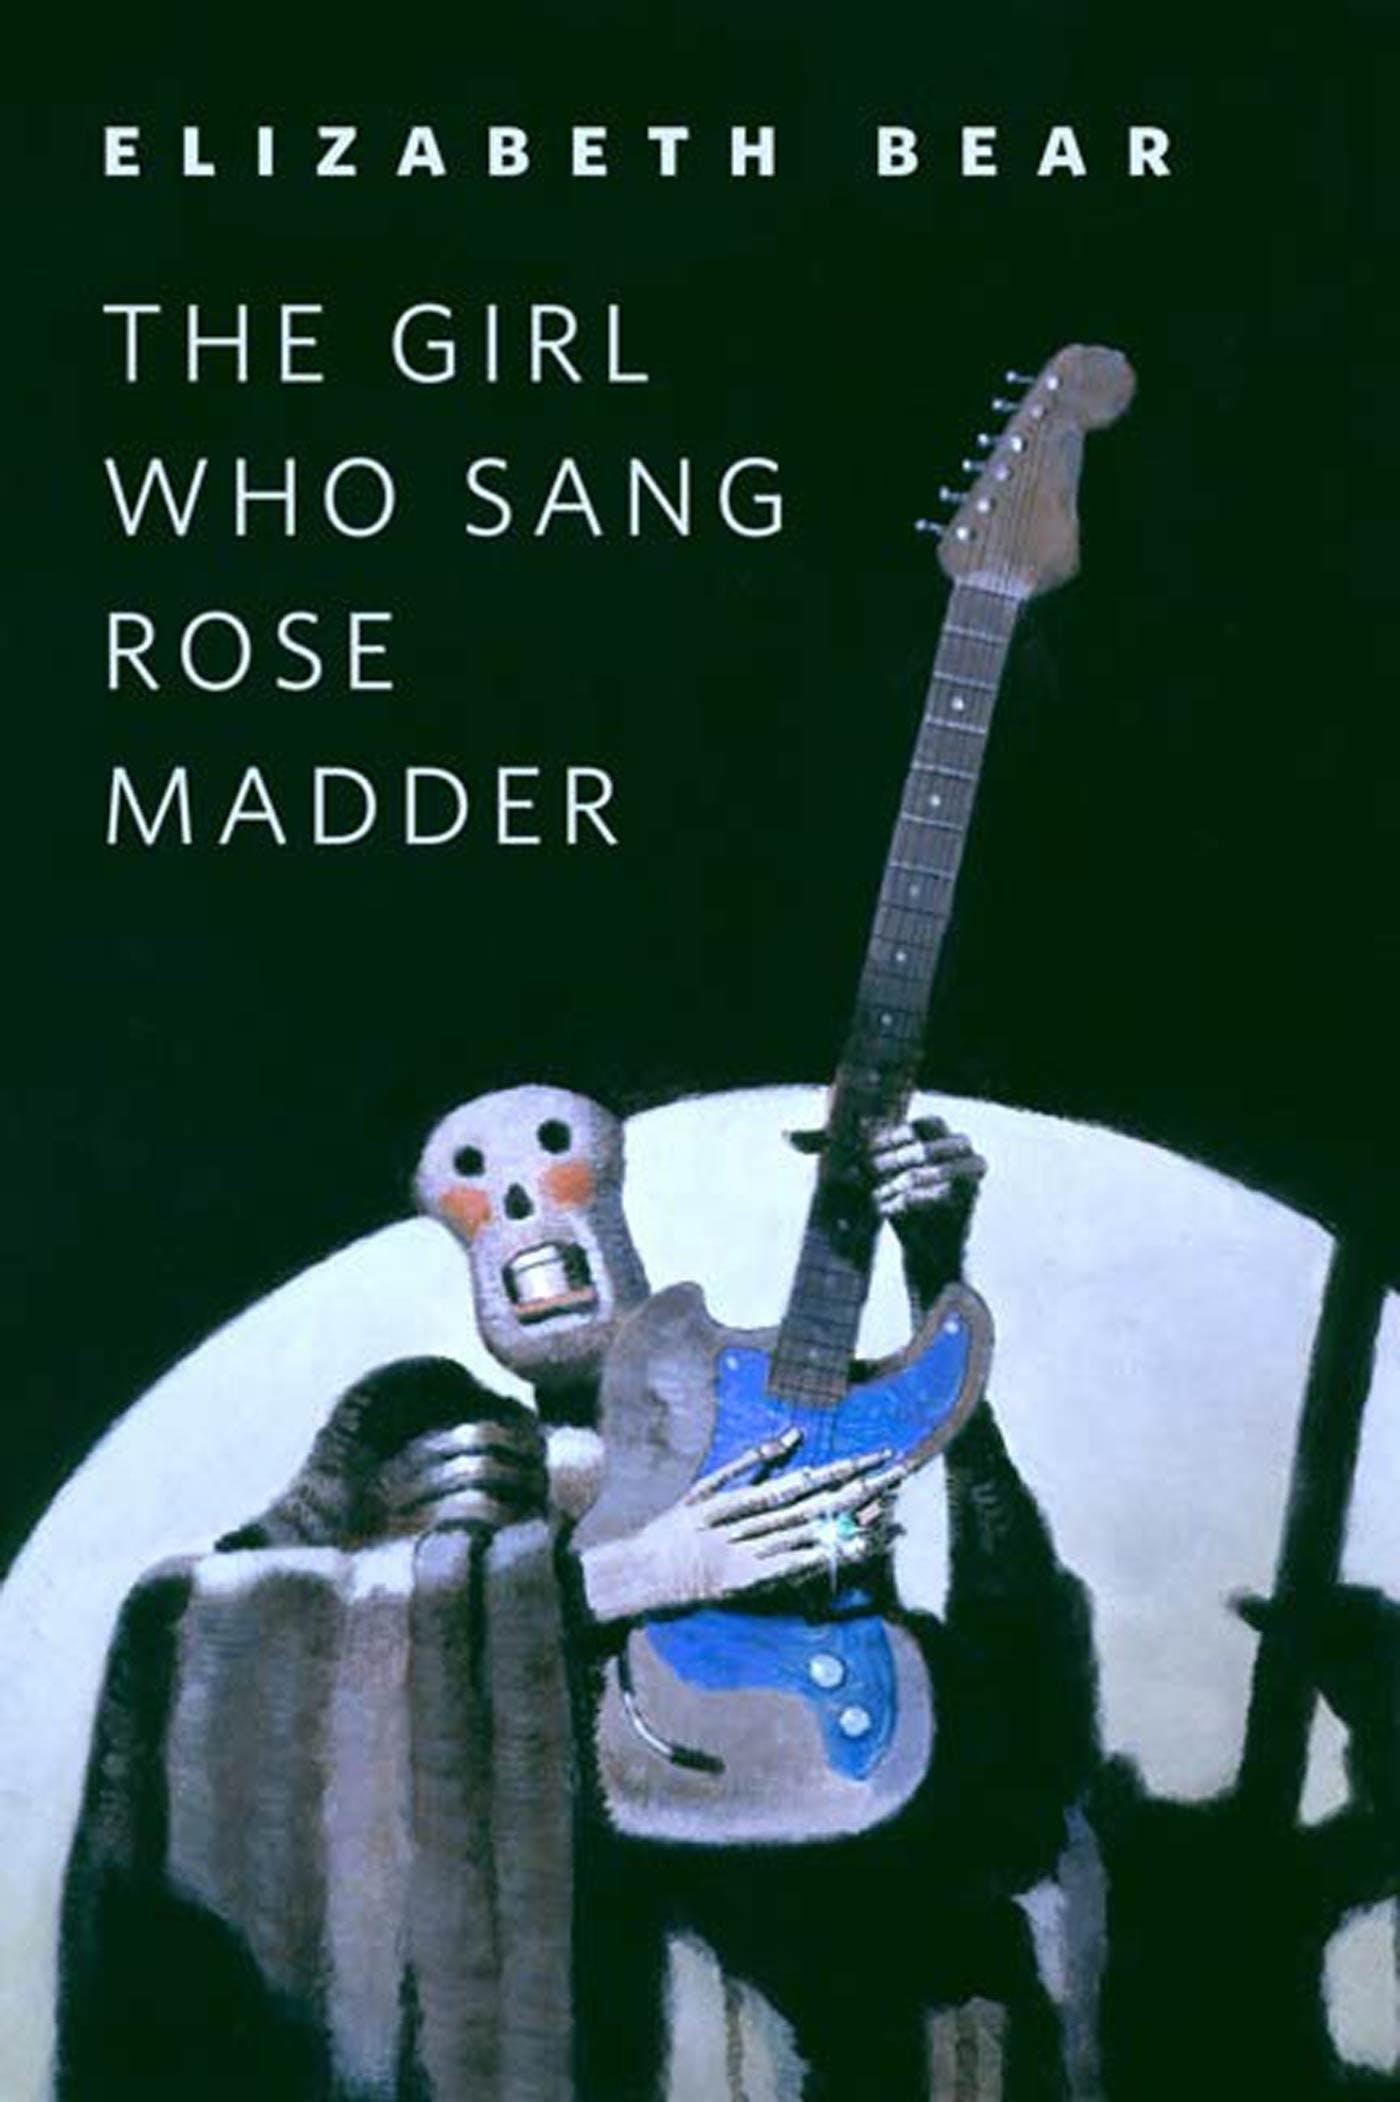 Image of The Girl Who Sang Rose Madder